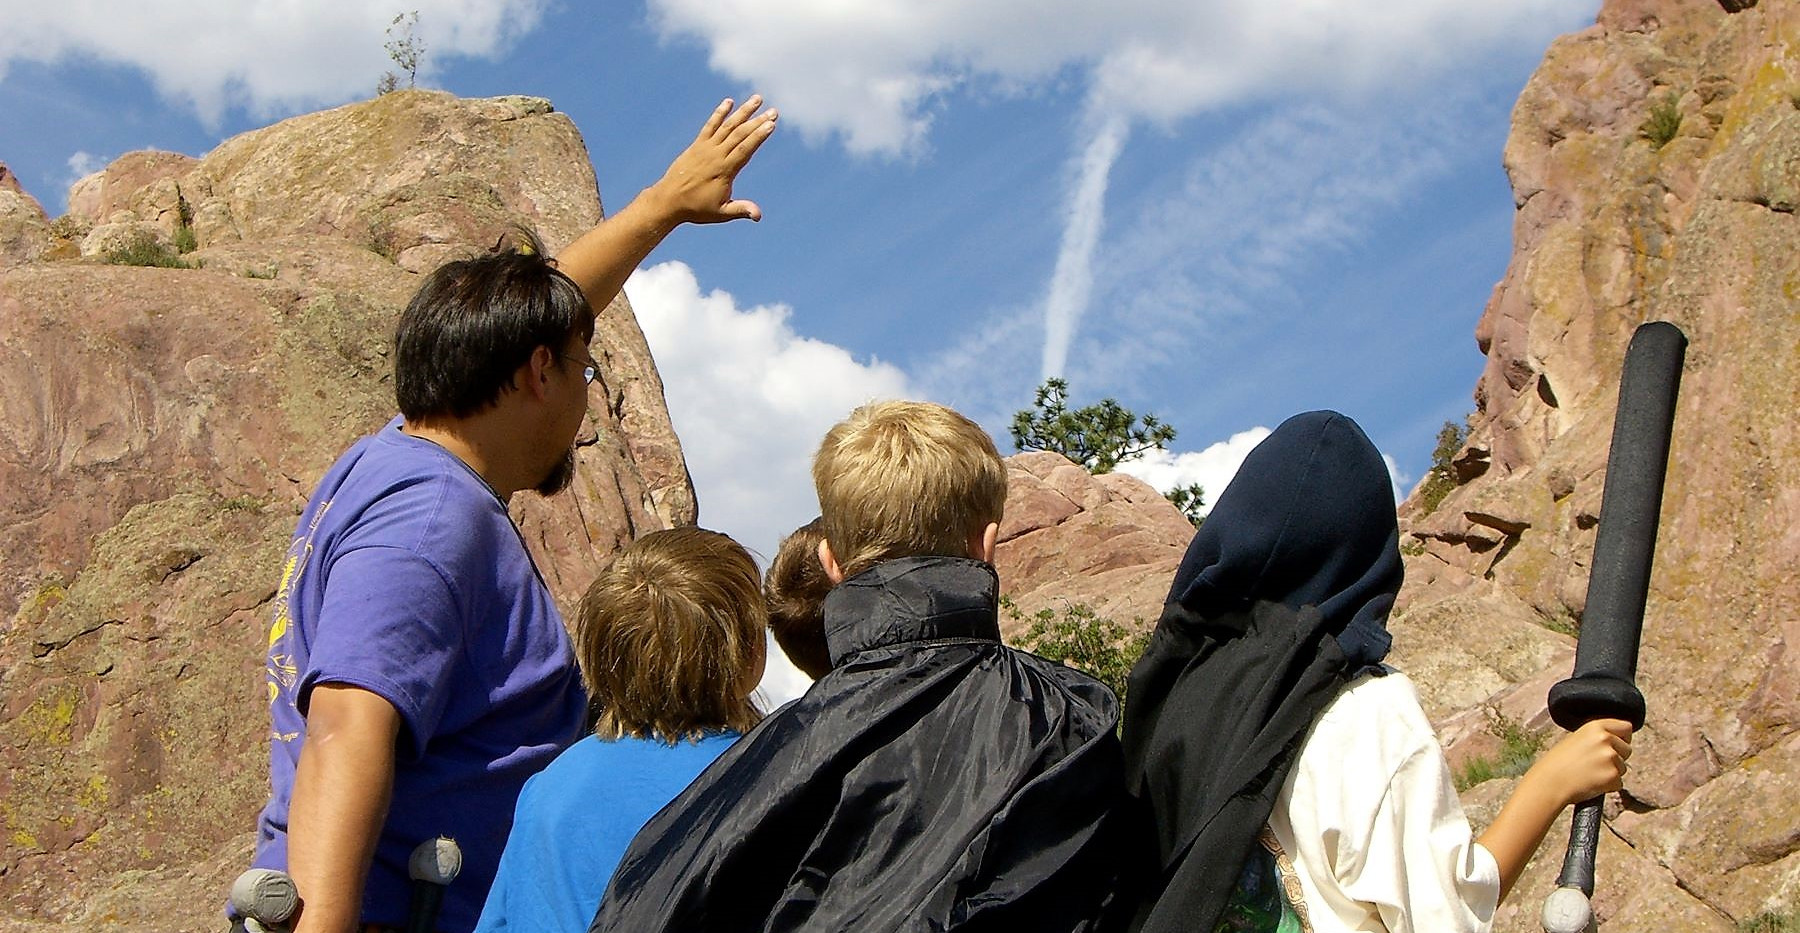 Joaquin and Group Looking at Sky.jpg